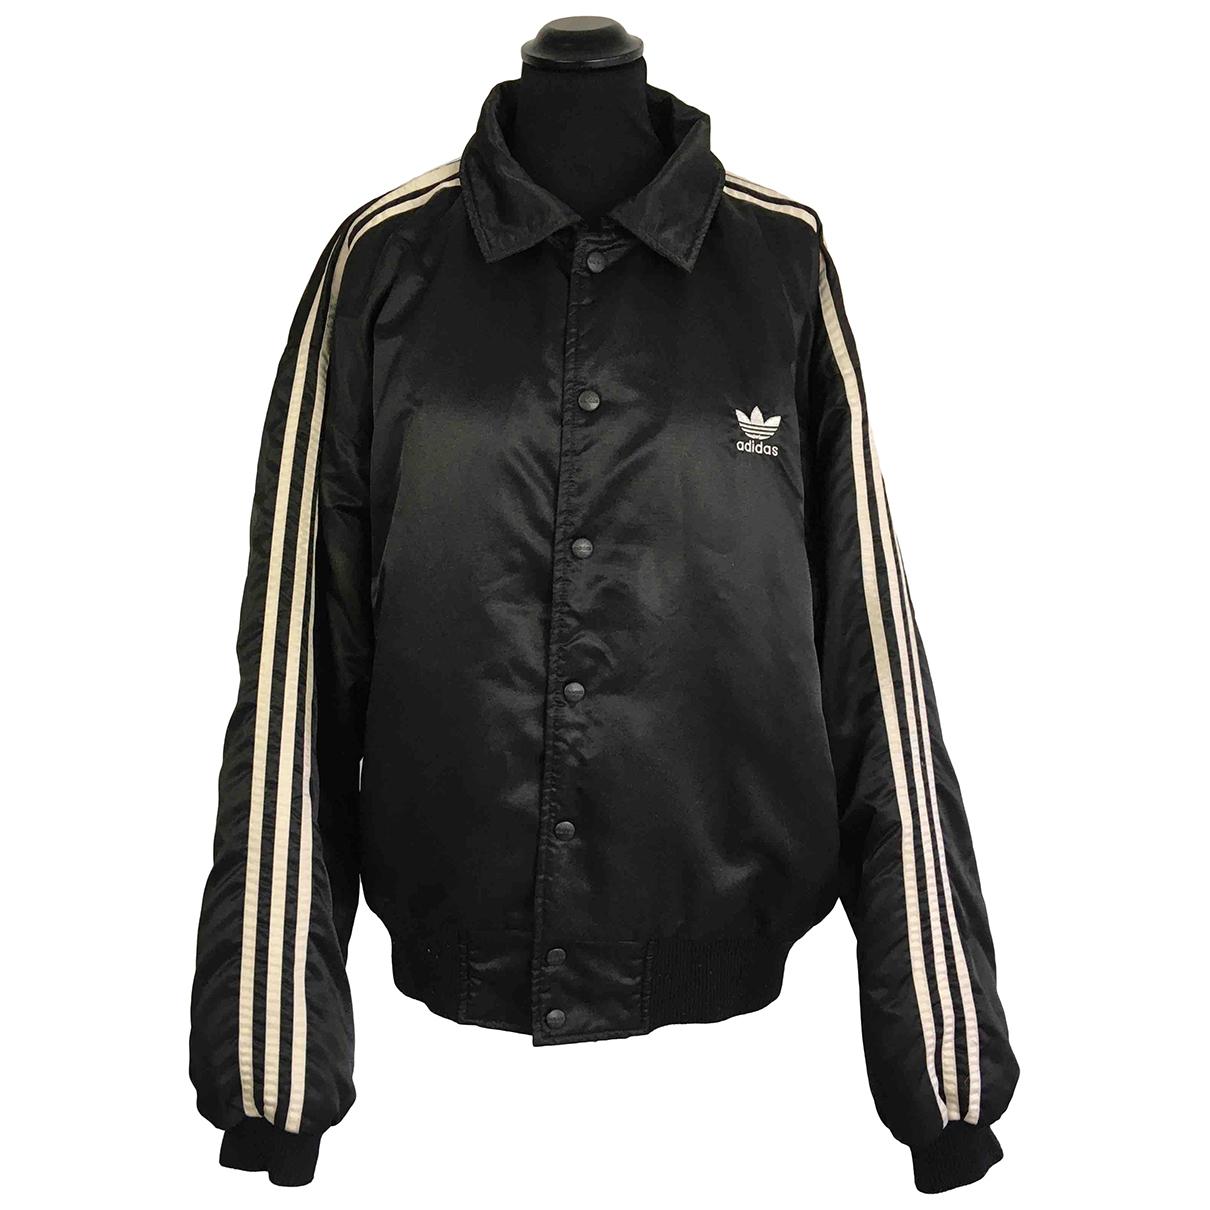 Adidas \N Jacke in  Schwarz Synthetik